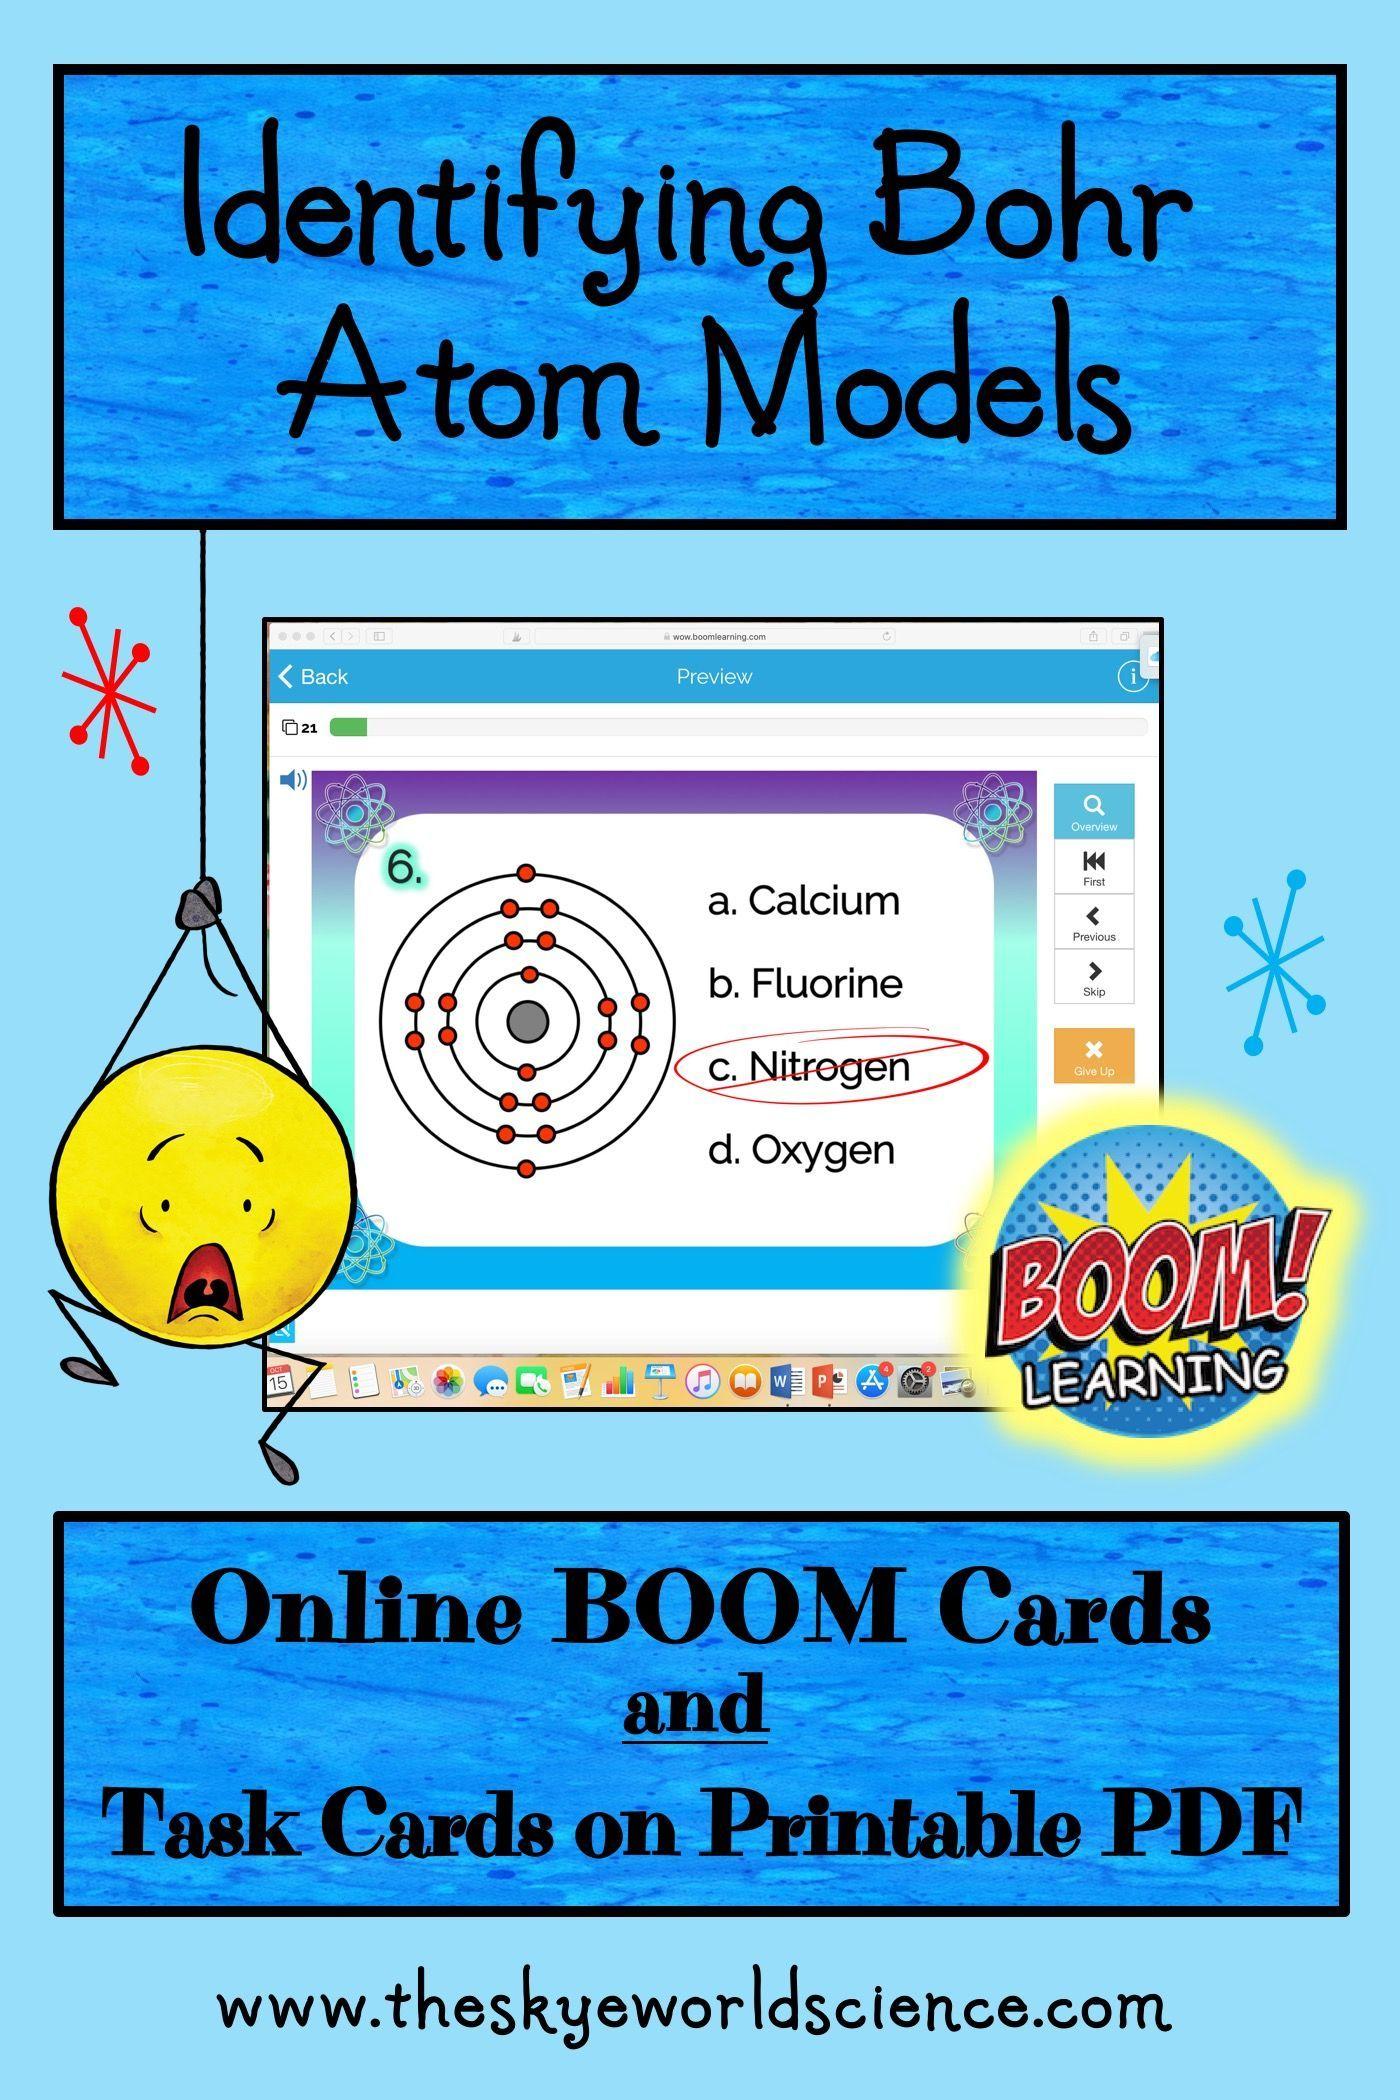 Identifying Bohr Atom Models Task Cards